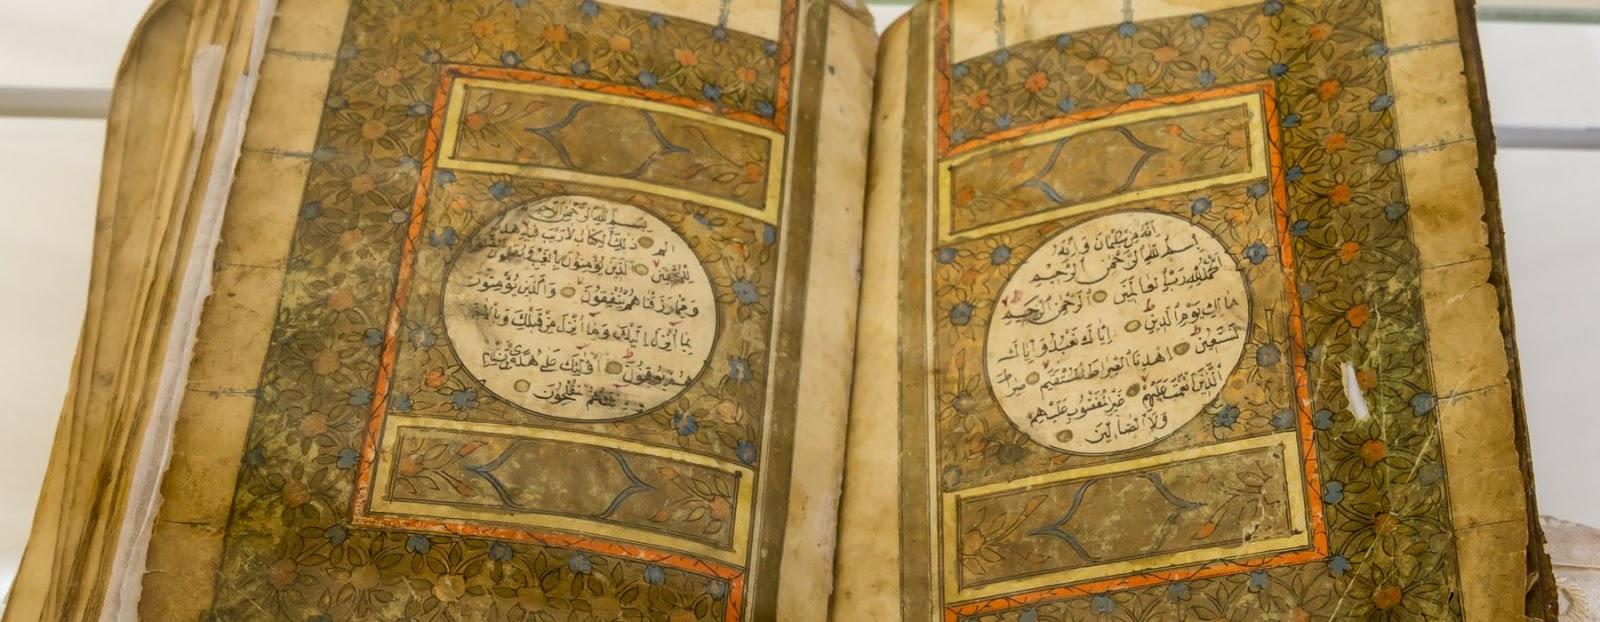 Surat Al Falaq Waktu Subuh 5 Ayat Al Quran Dan